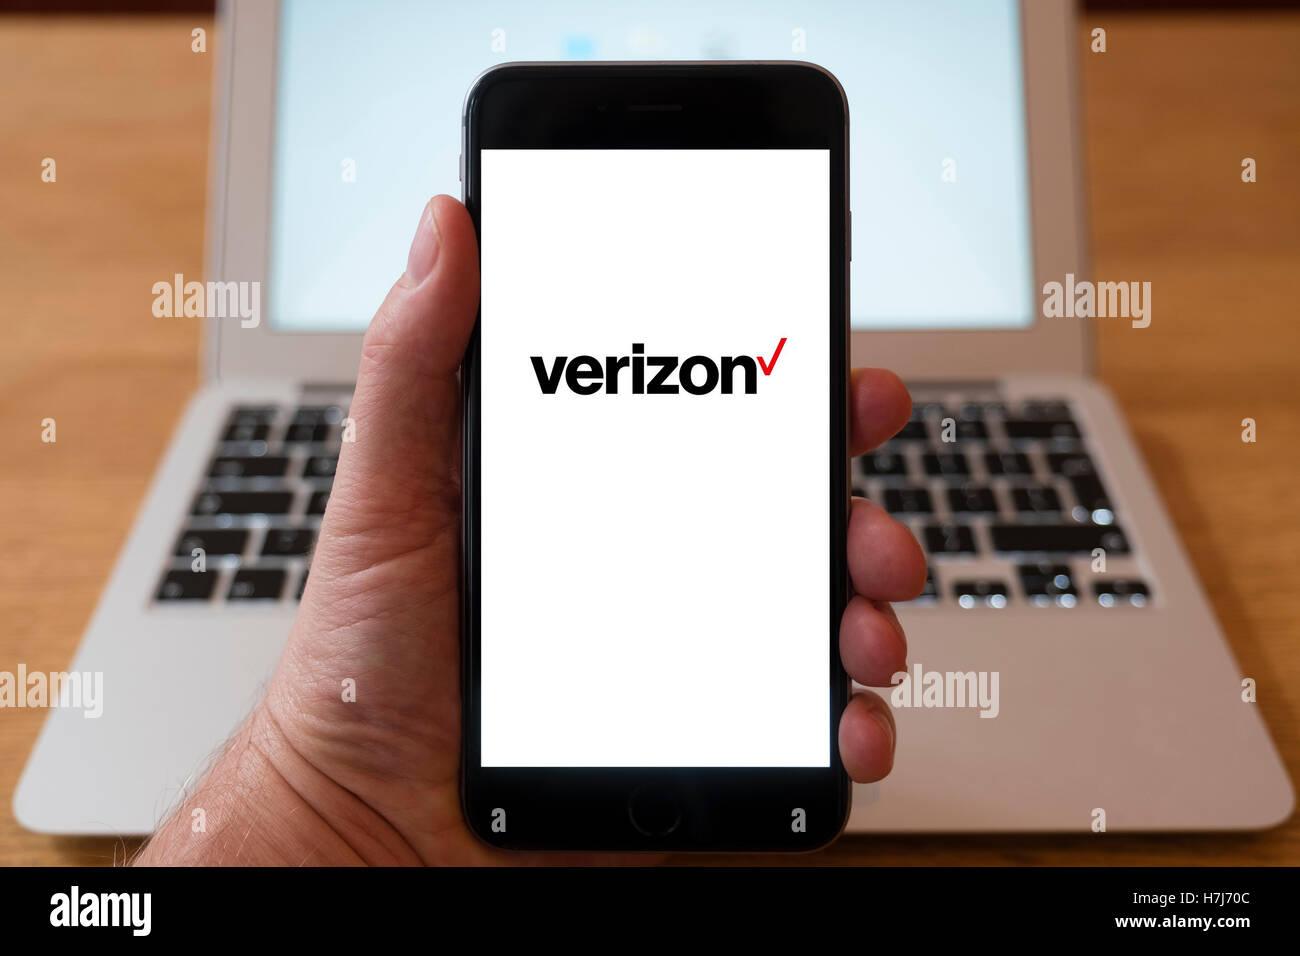 Using iPhone smartphone to display logo of Verizon US  telecommunications company - Stock Image